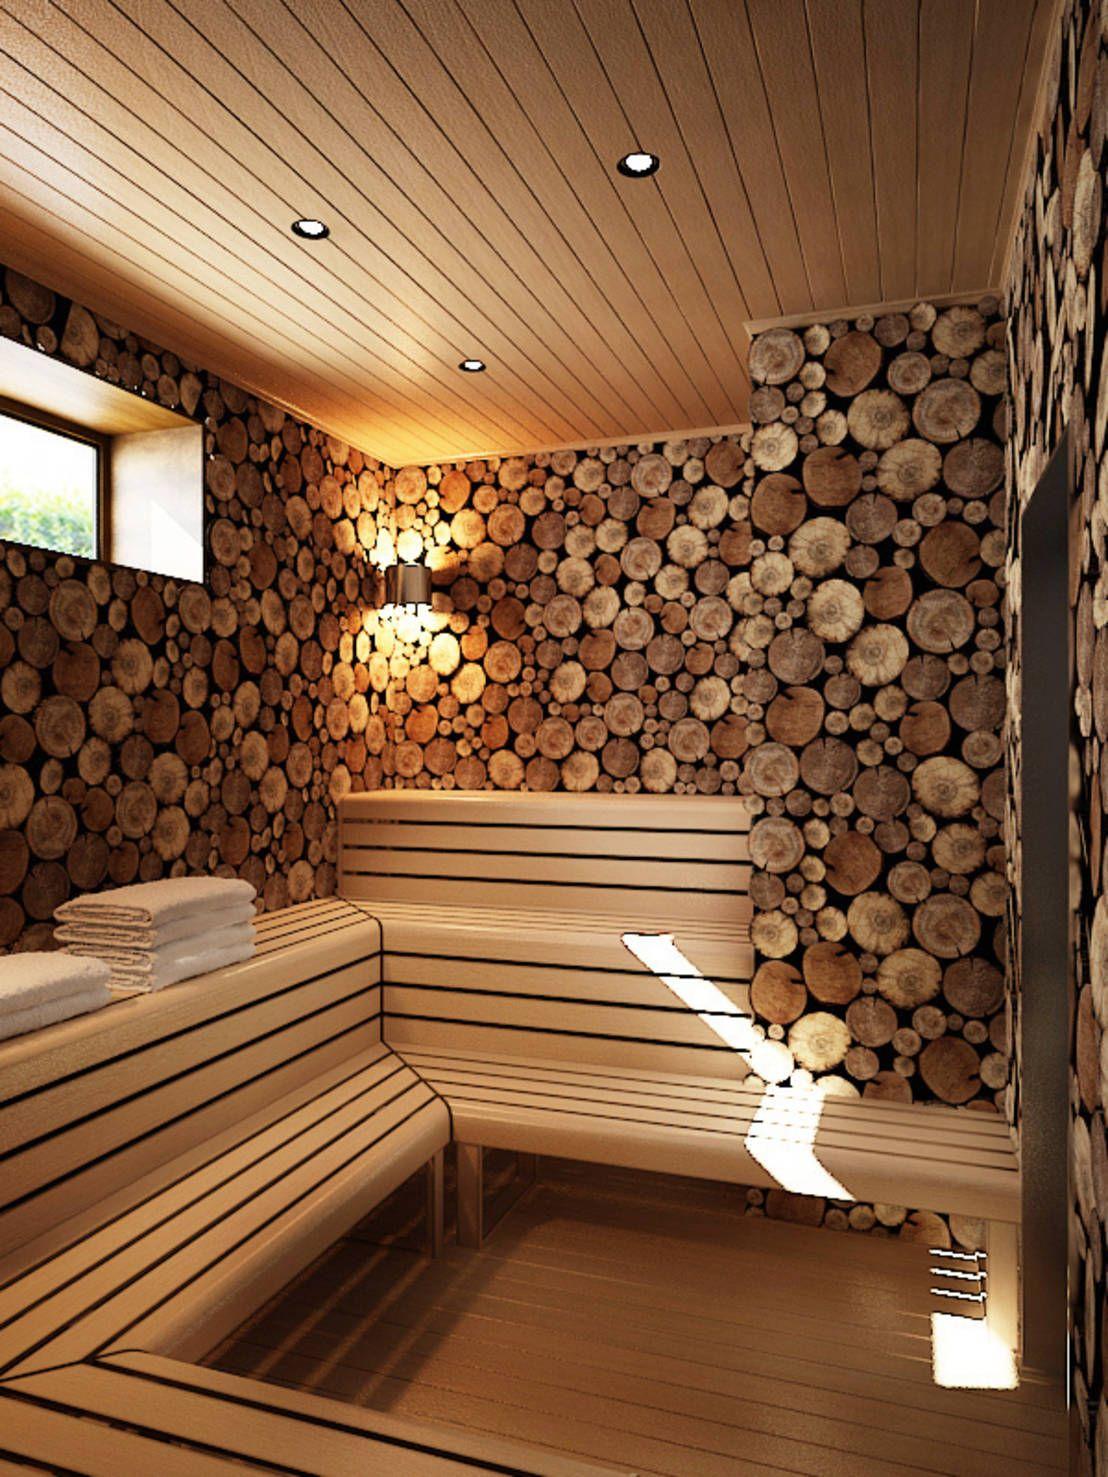 Graue nasszellenfliesen  вариантов дизайна интерьера домашней сауны  sauna  pinterest